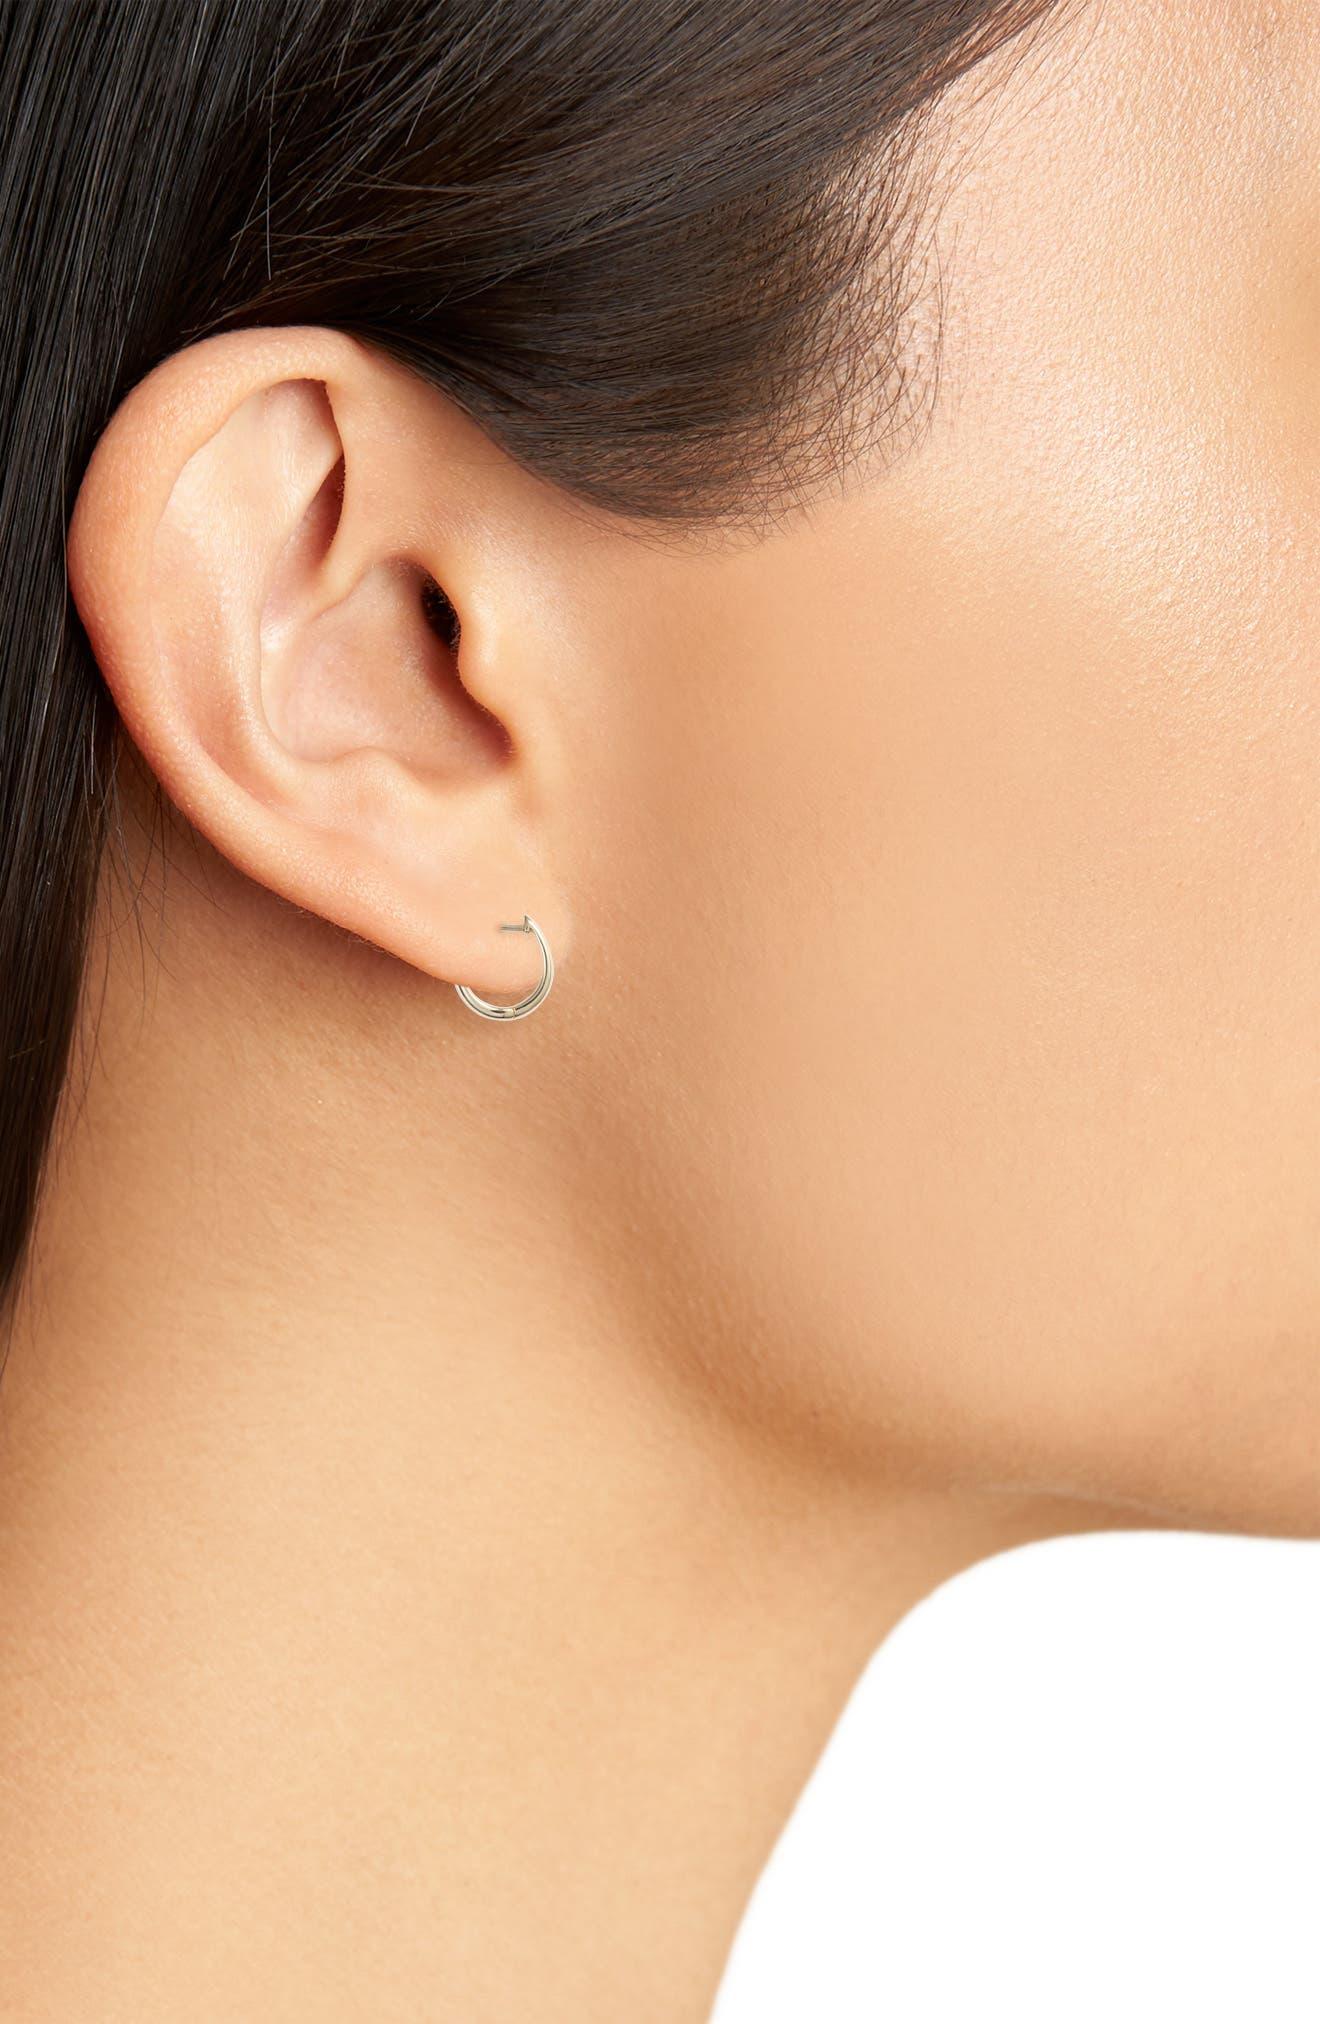 BONY LEVY,                             14K Gold Hoop Earrings,                             Alternate thumbnail 2, color,                             YELLOW GOLD/ DIA